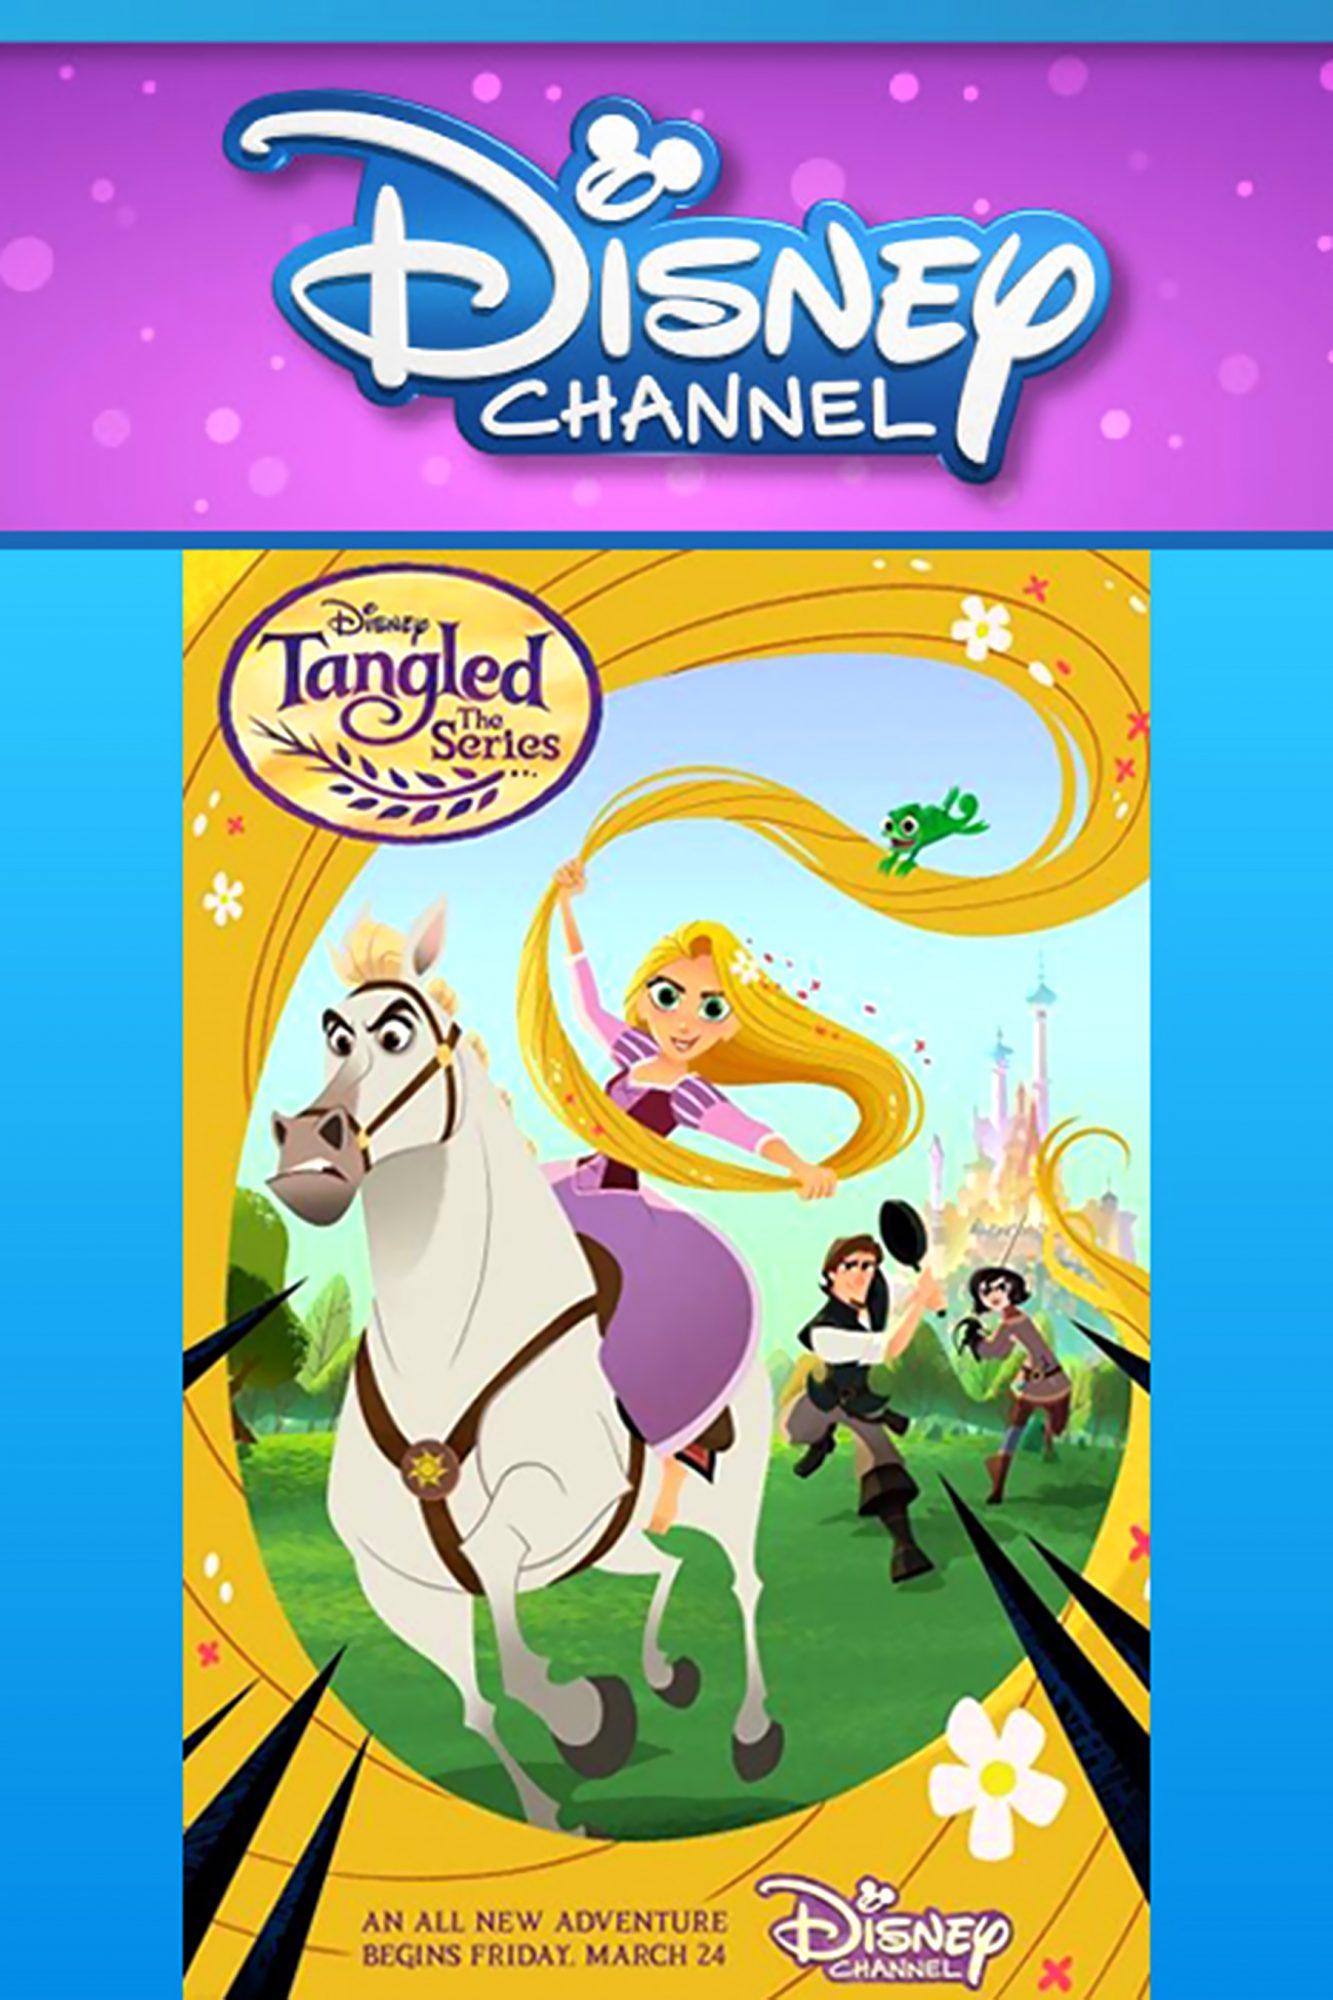 Tangled tv series